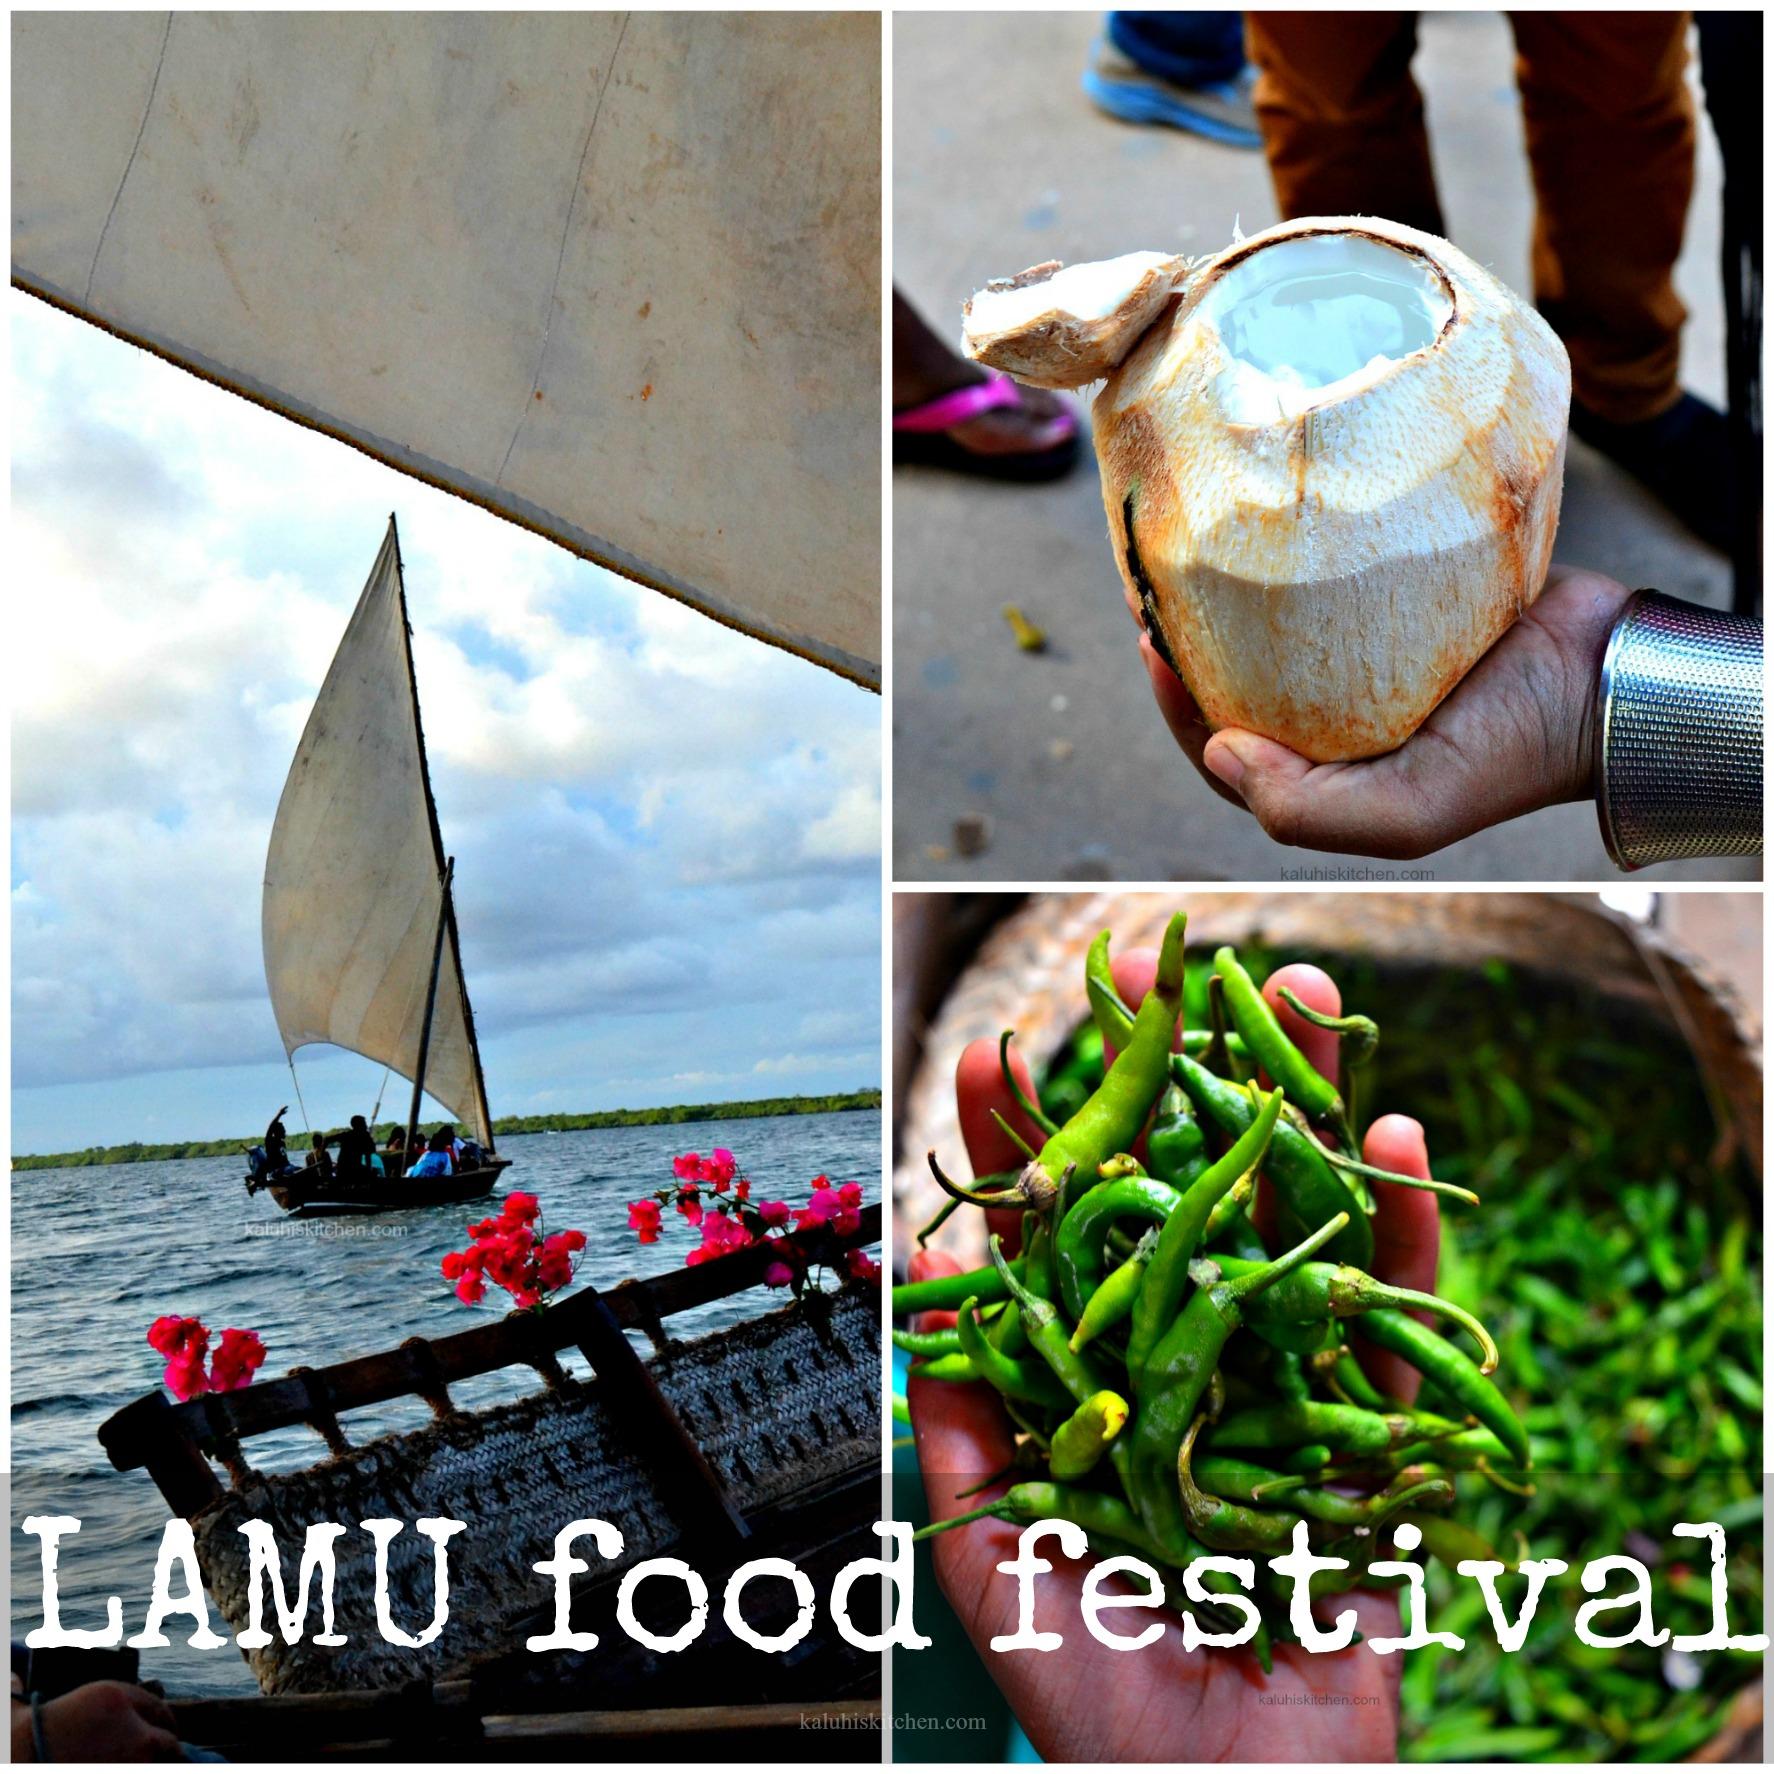 LAMU FOOD FESTIVAL COVERED BY BEST KENYAN FOOD BLOGGERS KALUHI, WANGECI WANDERE, GATUIRI IRAUKA, MOHAMED ABDULRAHMAN, JAYSON MBOGOH, LYRA AOKO, KAREN LUCAS_ONJA BLOGGERS